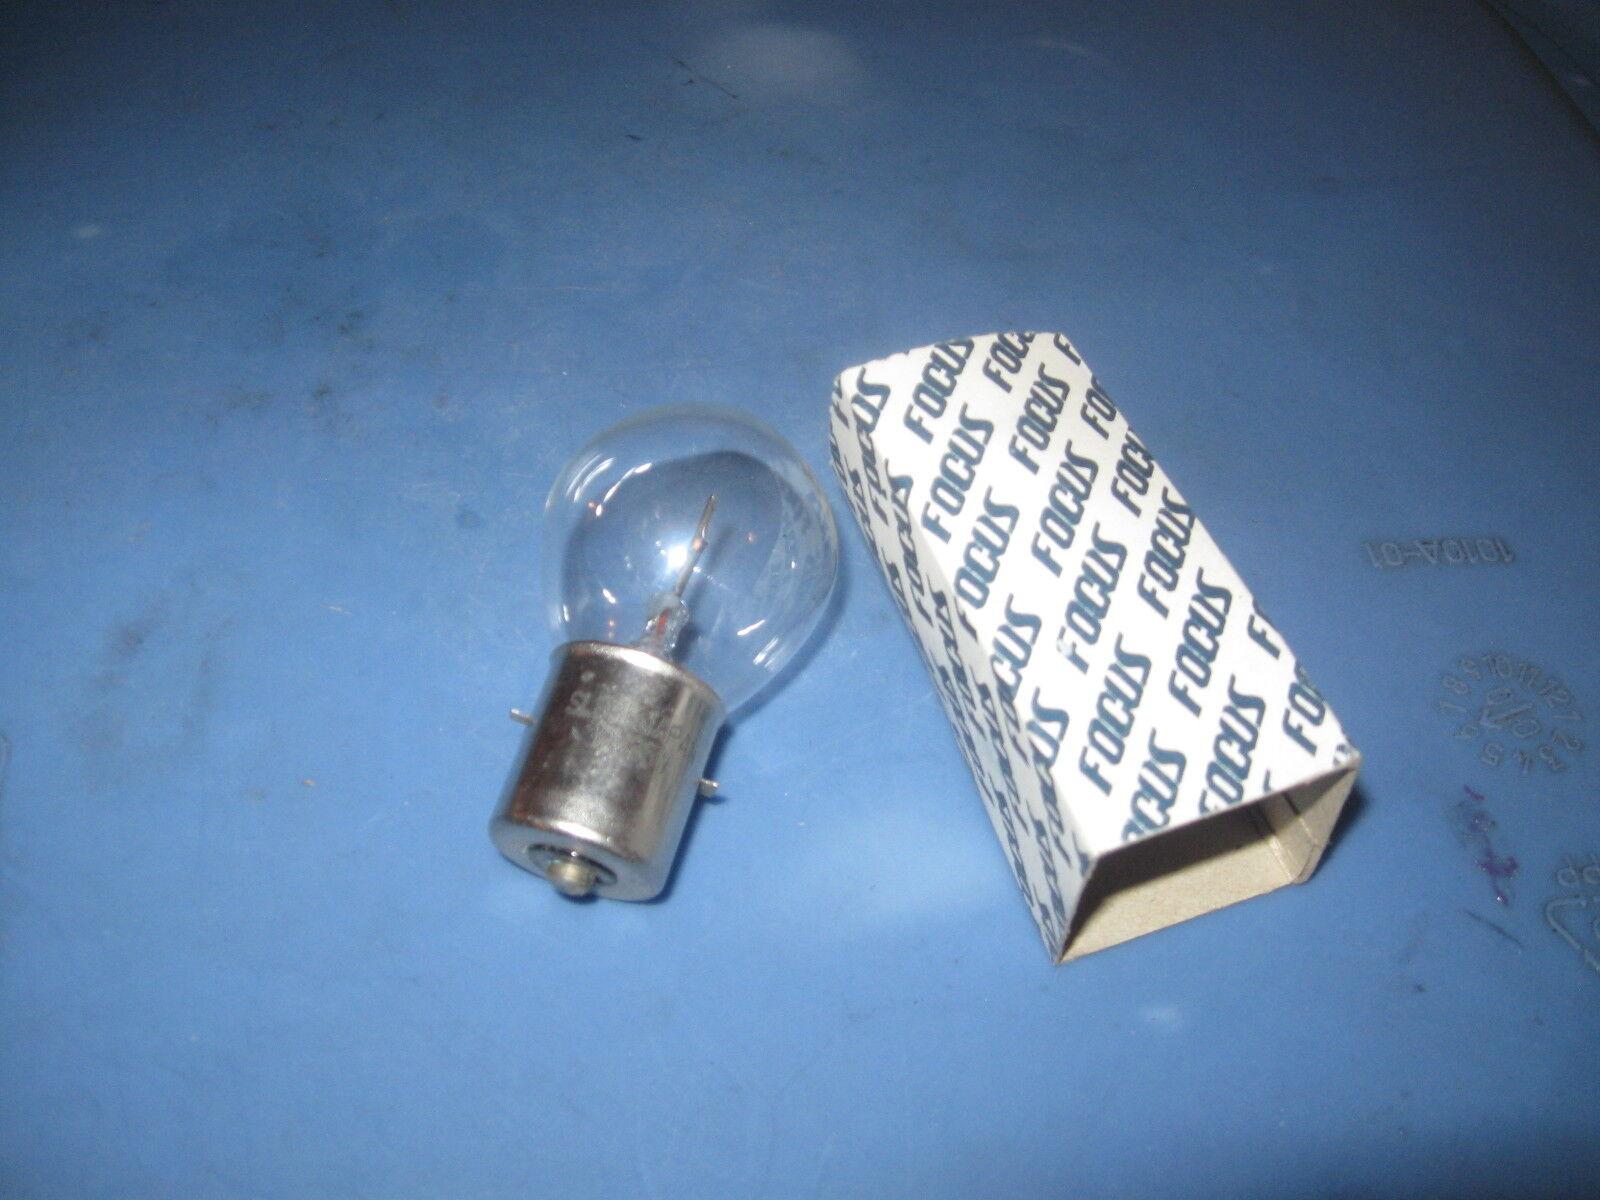 Snowmobile Headlight Bulb. 12V35W. Single Contact. NOS Focus